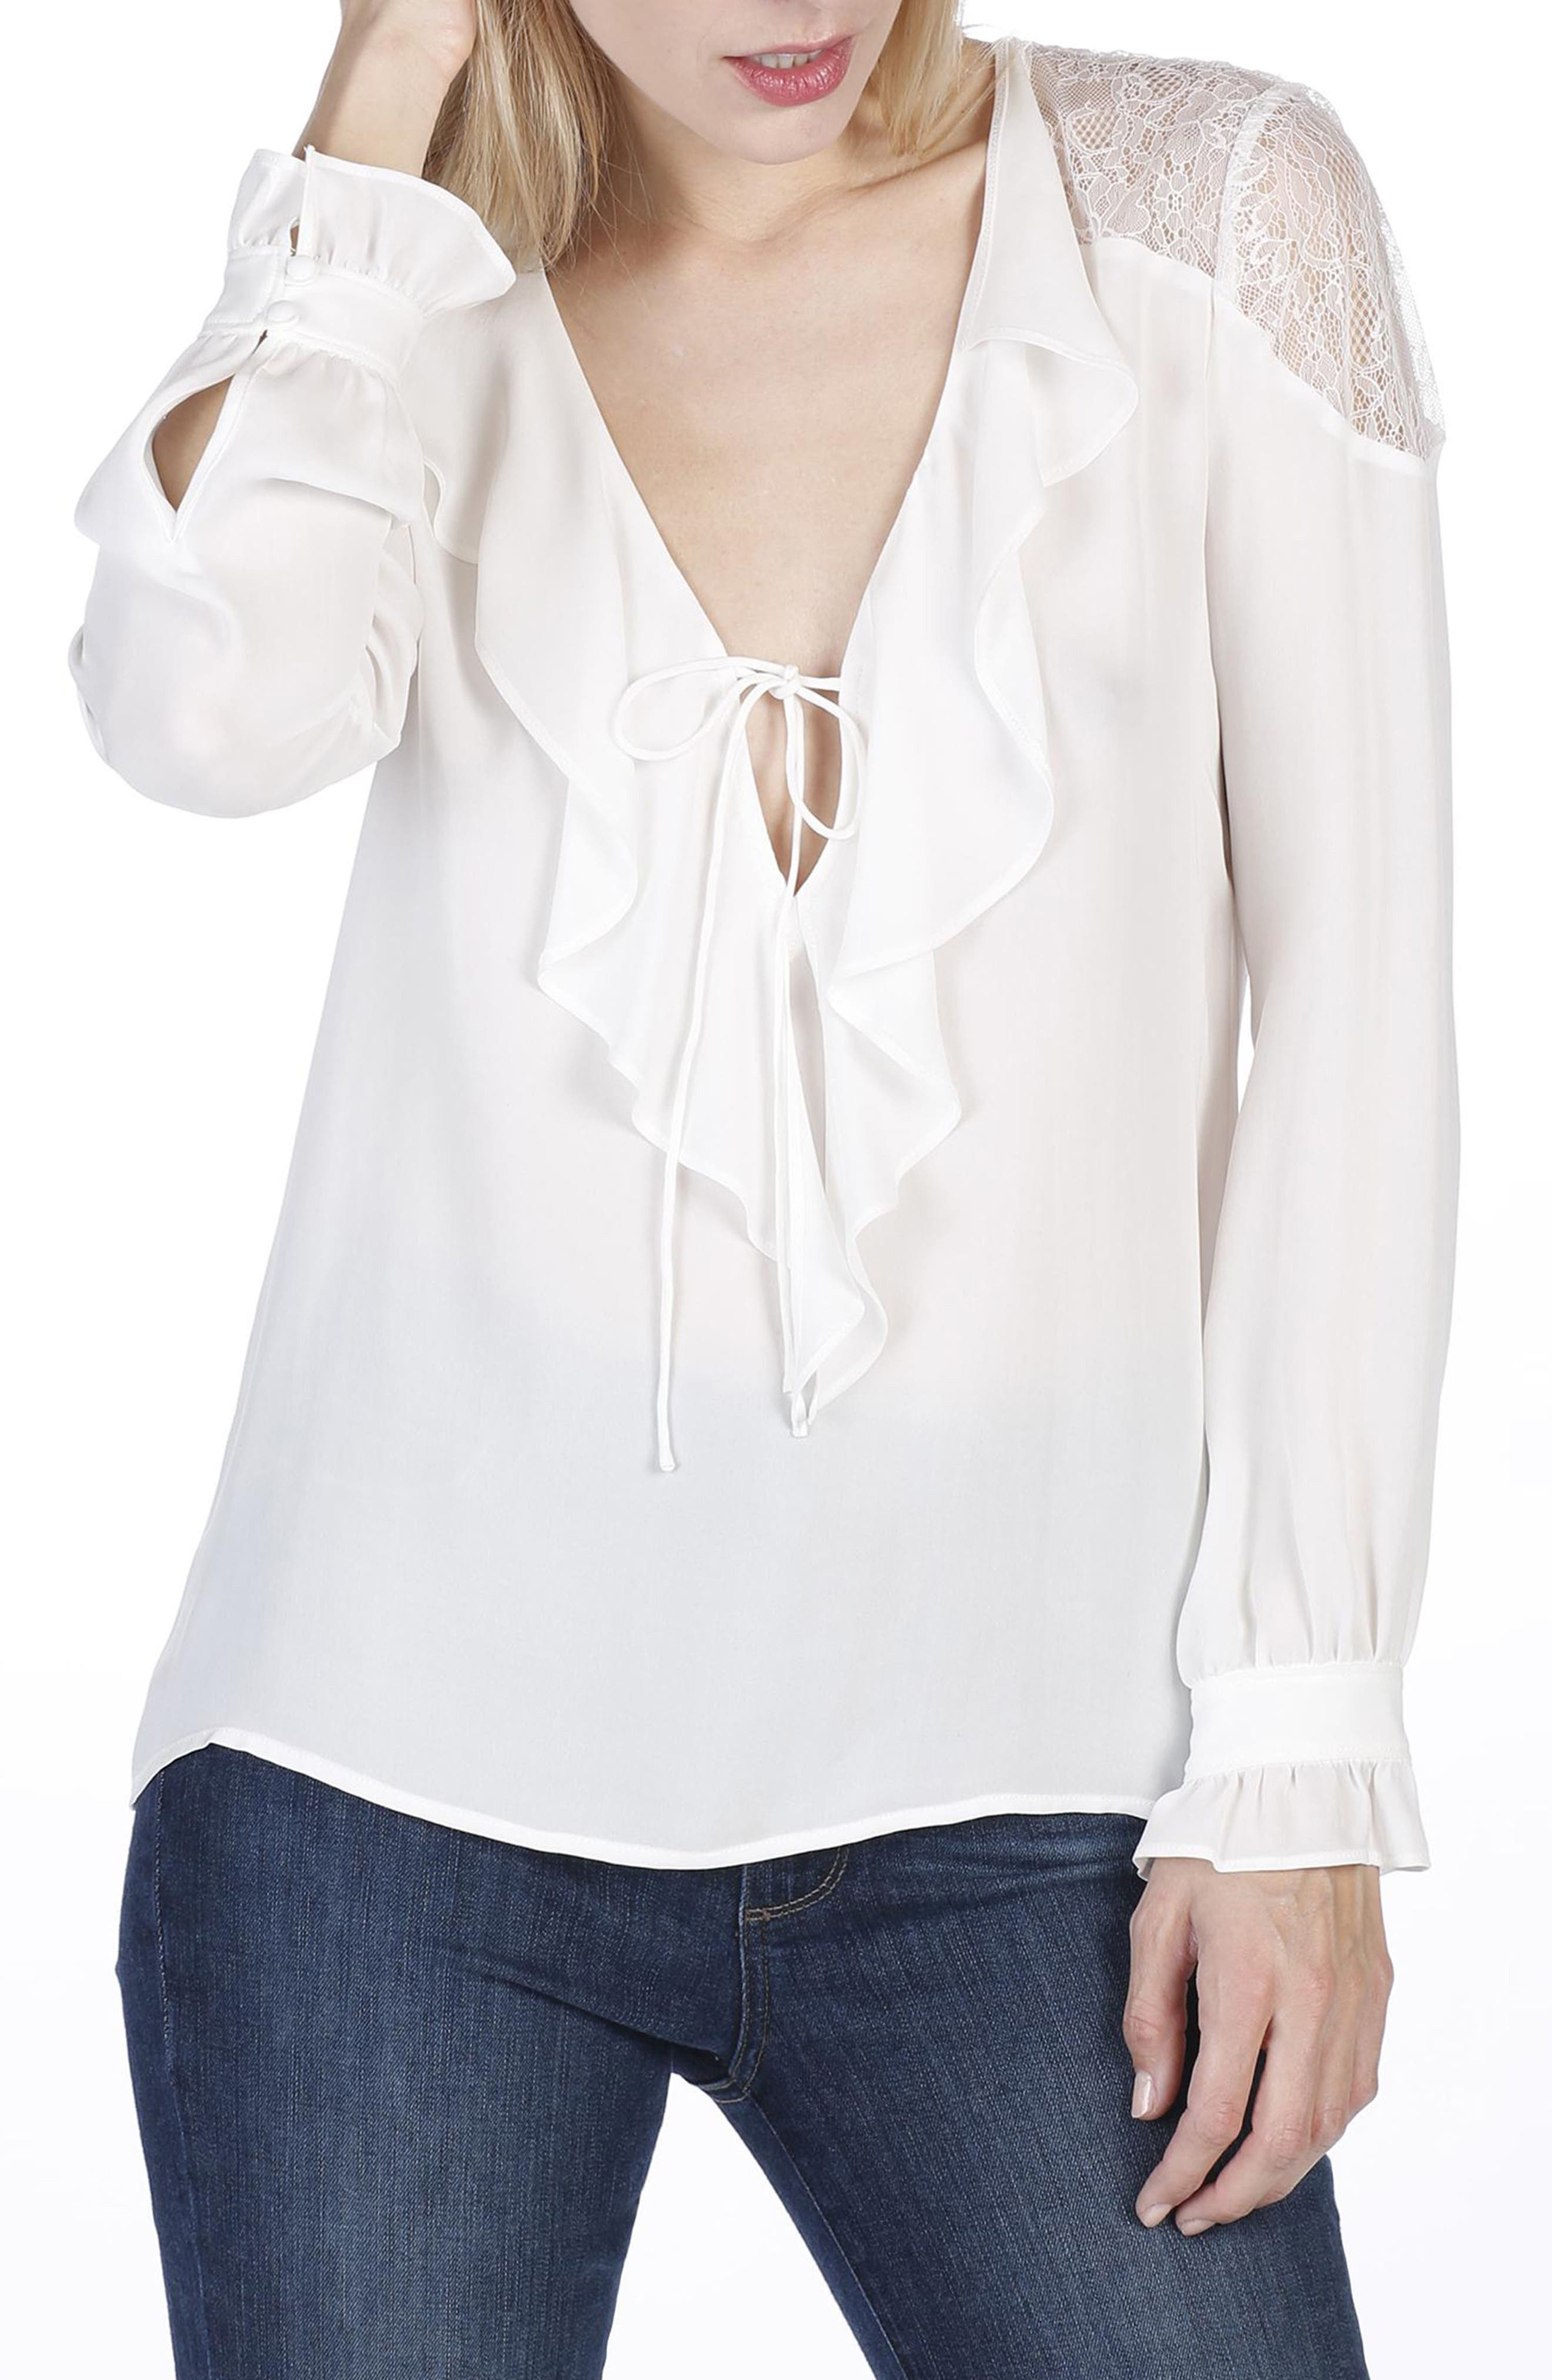 Celesse Blouse,                         Main,                         color, White